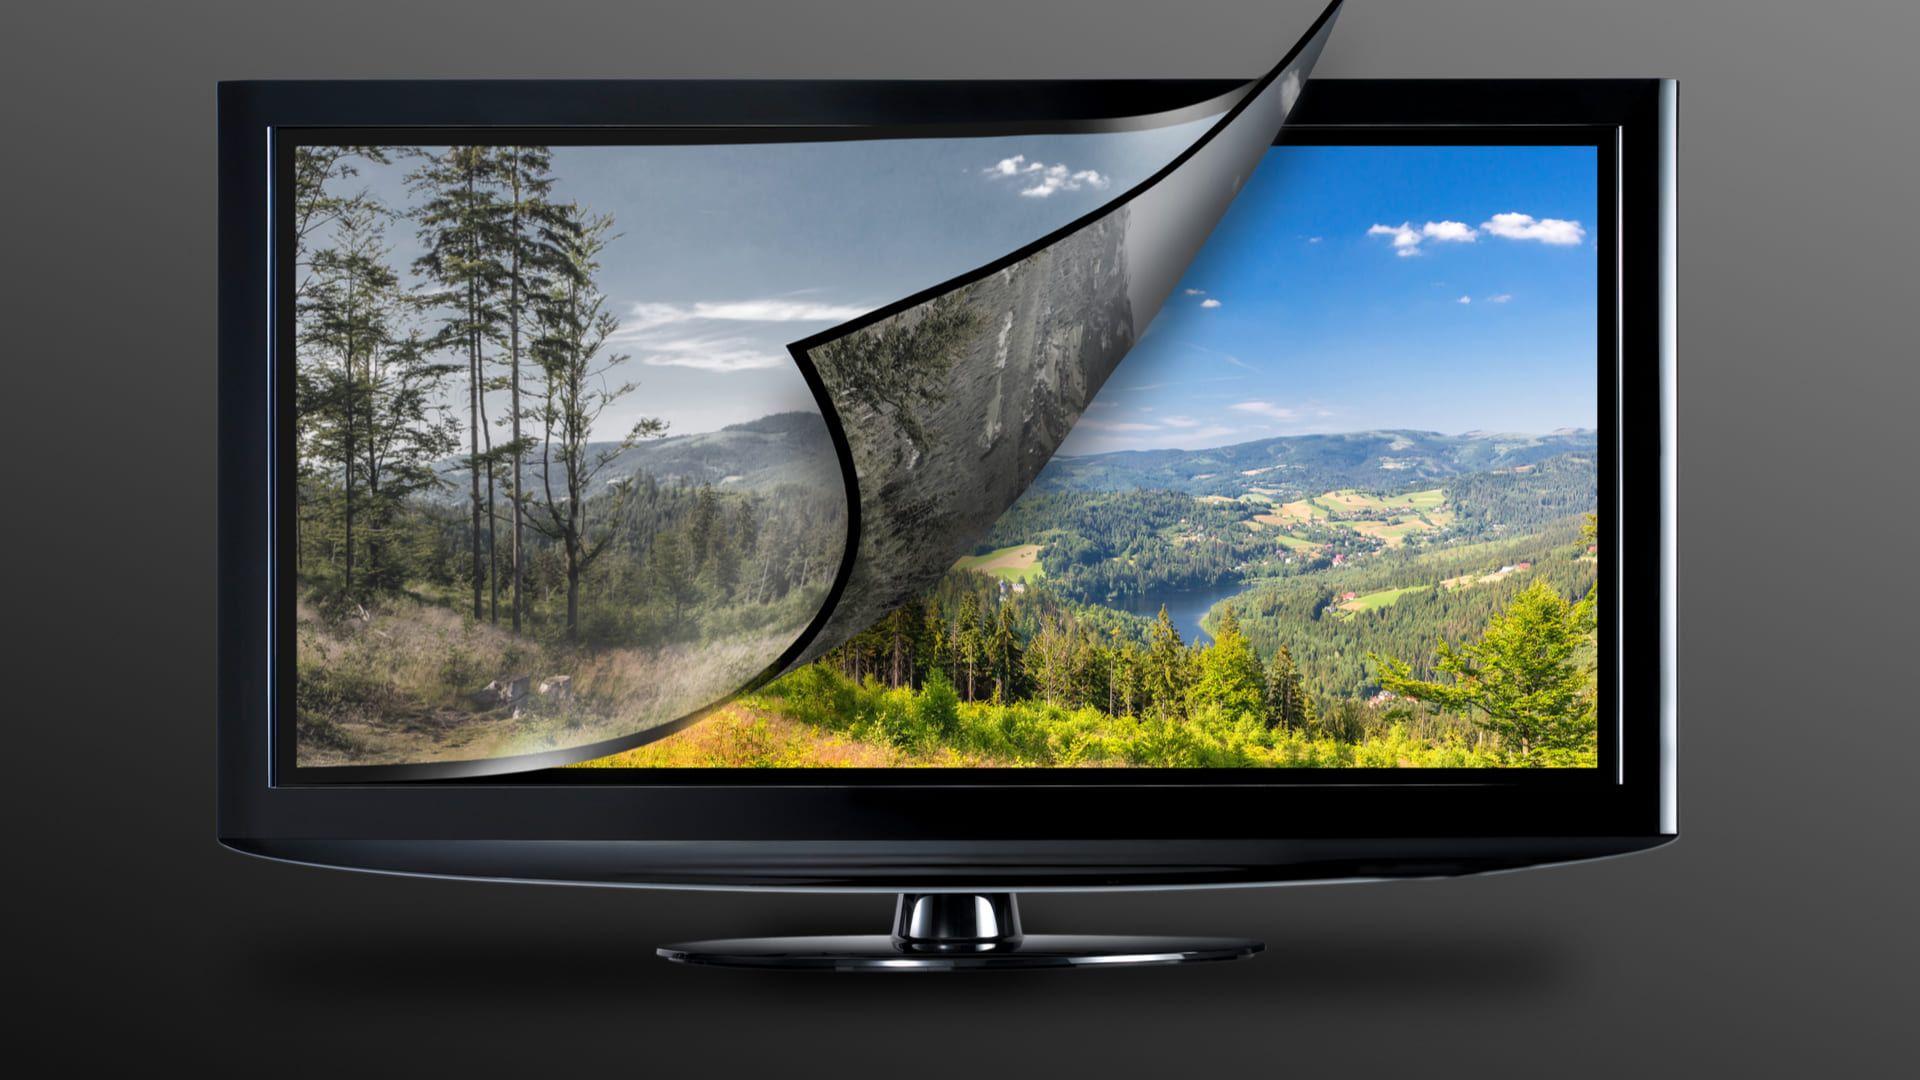 Confira os melhores modelos de monitor 144Hz de 2021 (REDPIXEL.PL/Shutterstock)